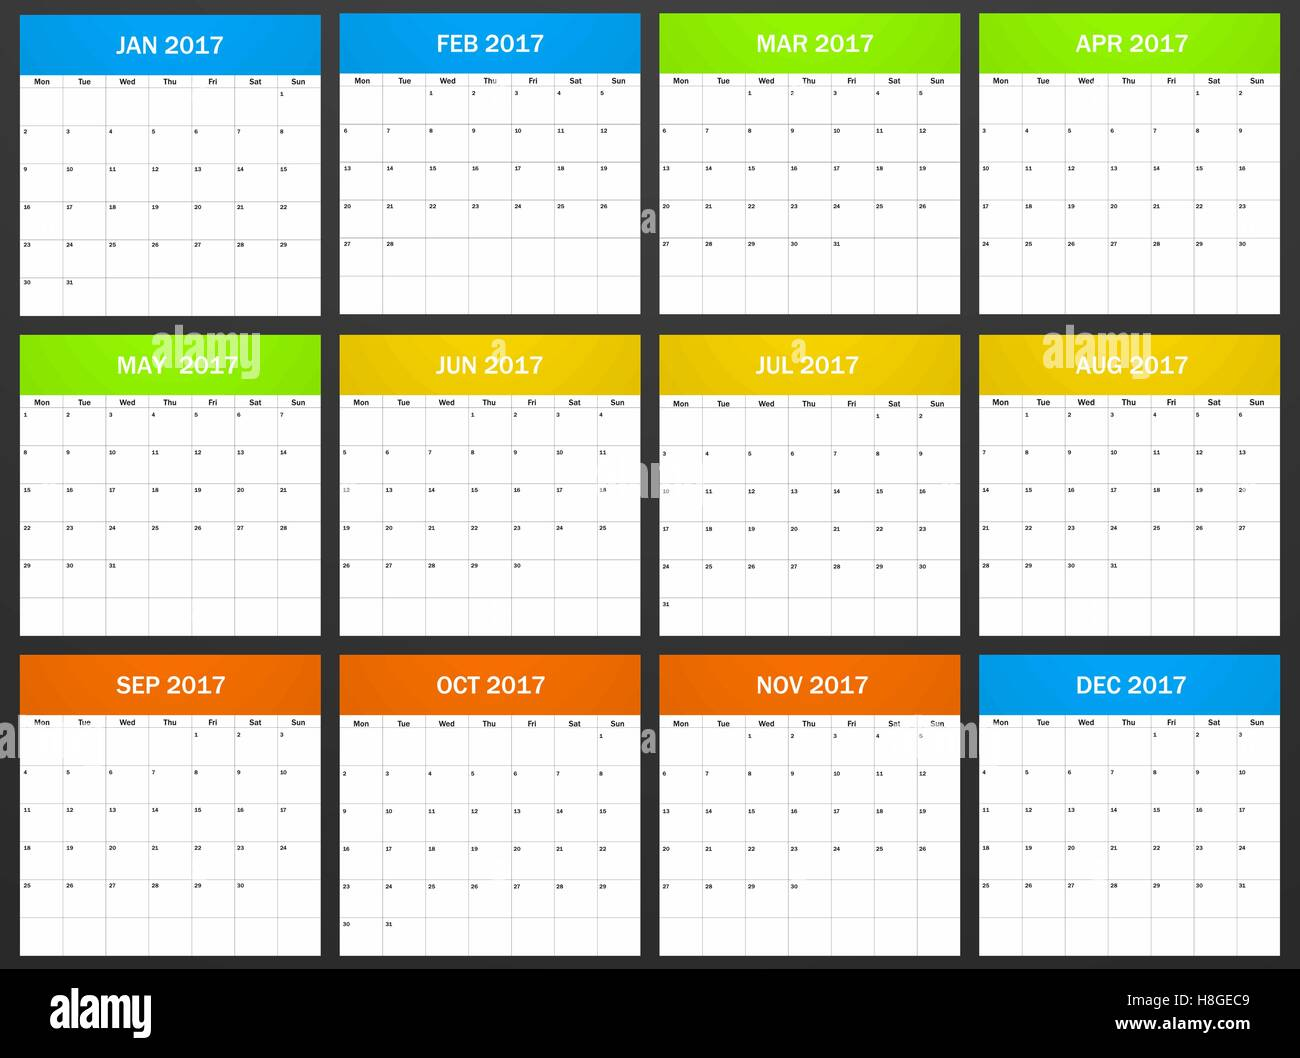 European Planner blank for 2017 Scheduler agenda or diary – Agenda Planner Template